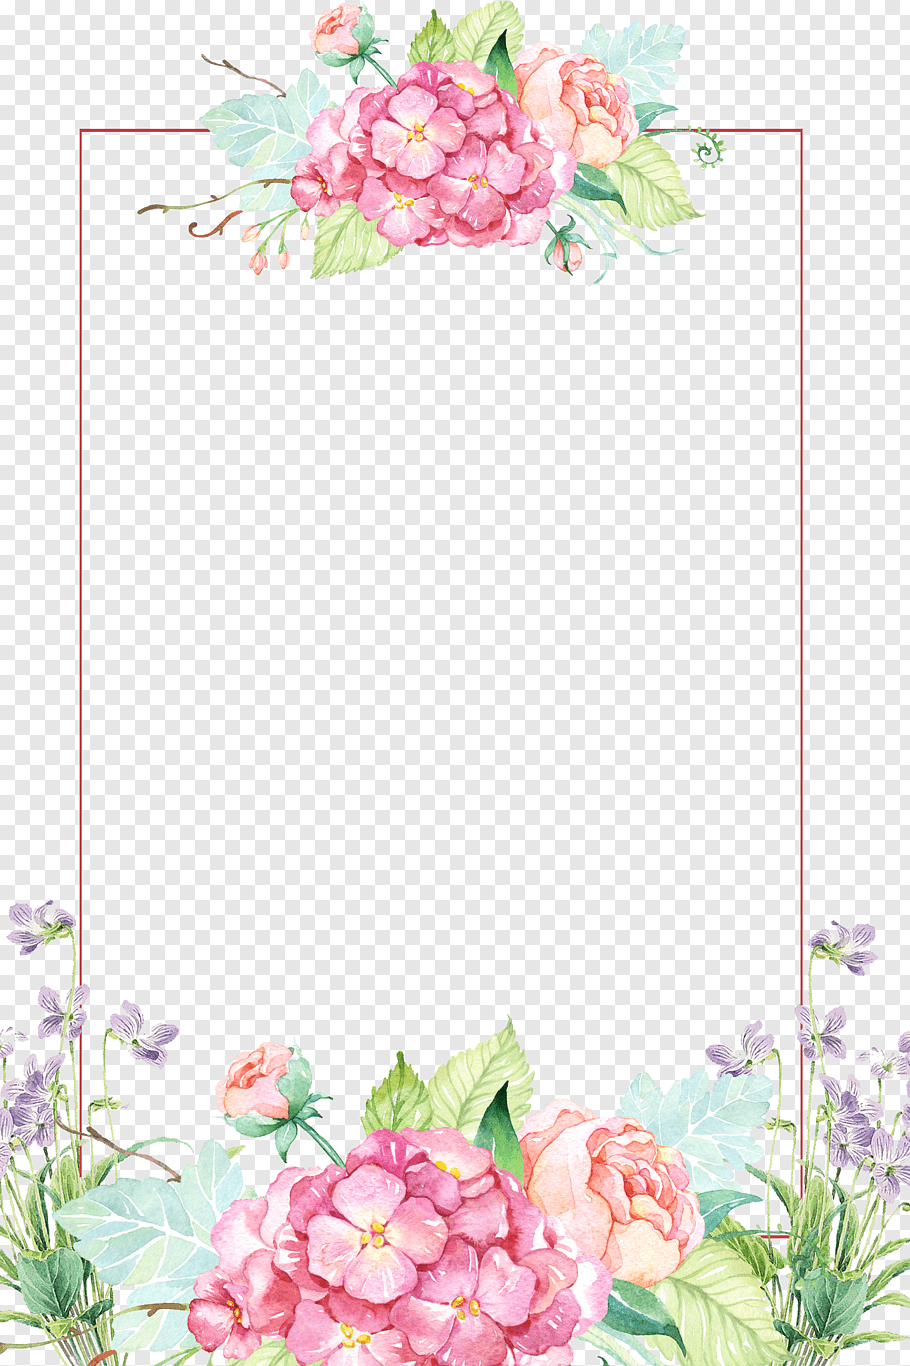 Flower Beautiful Flower Borders Pink And Yellow Floral Border Free Png Flower Border Png Flower Illustration Flower Border